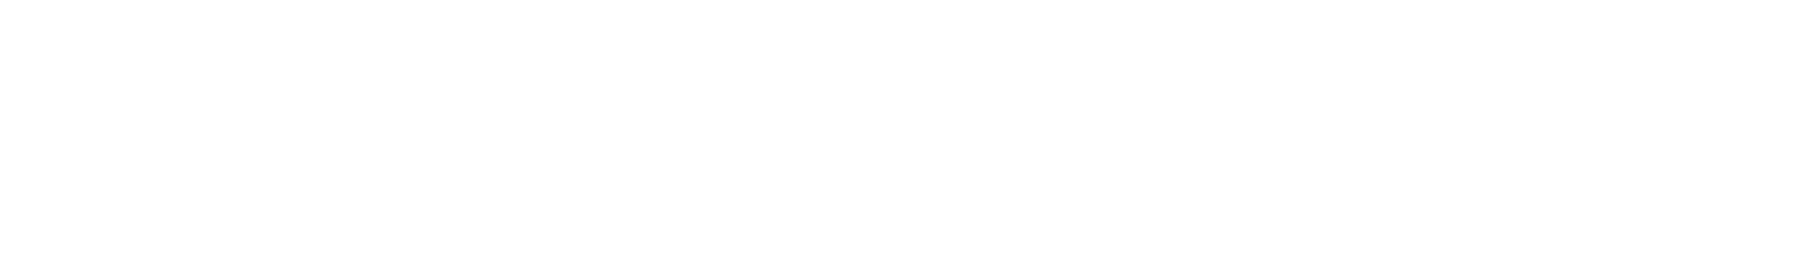 140 bpm g 002